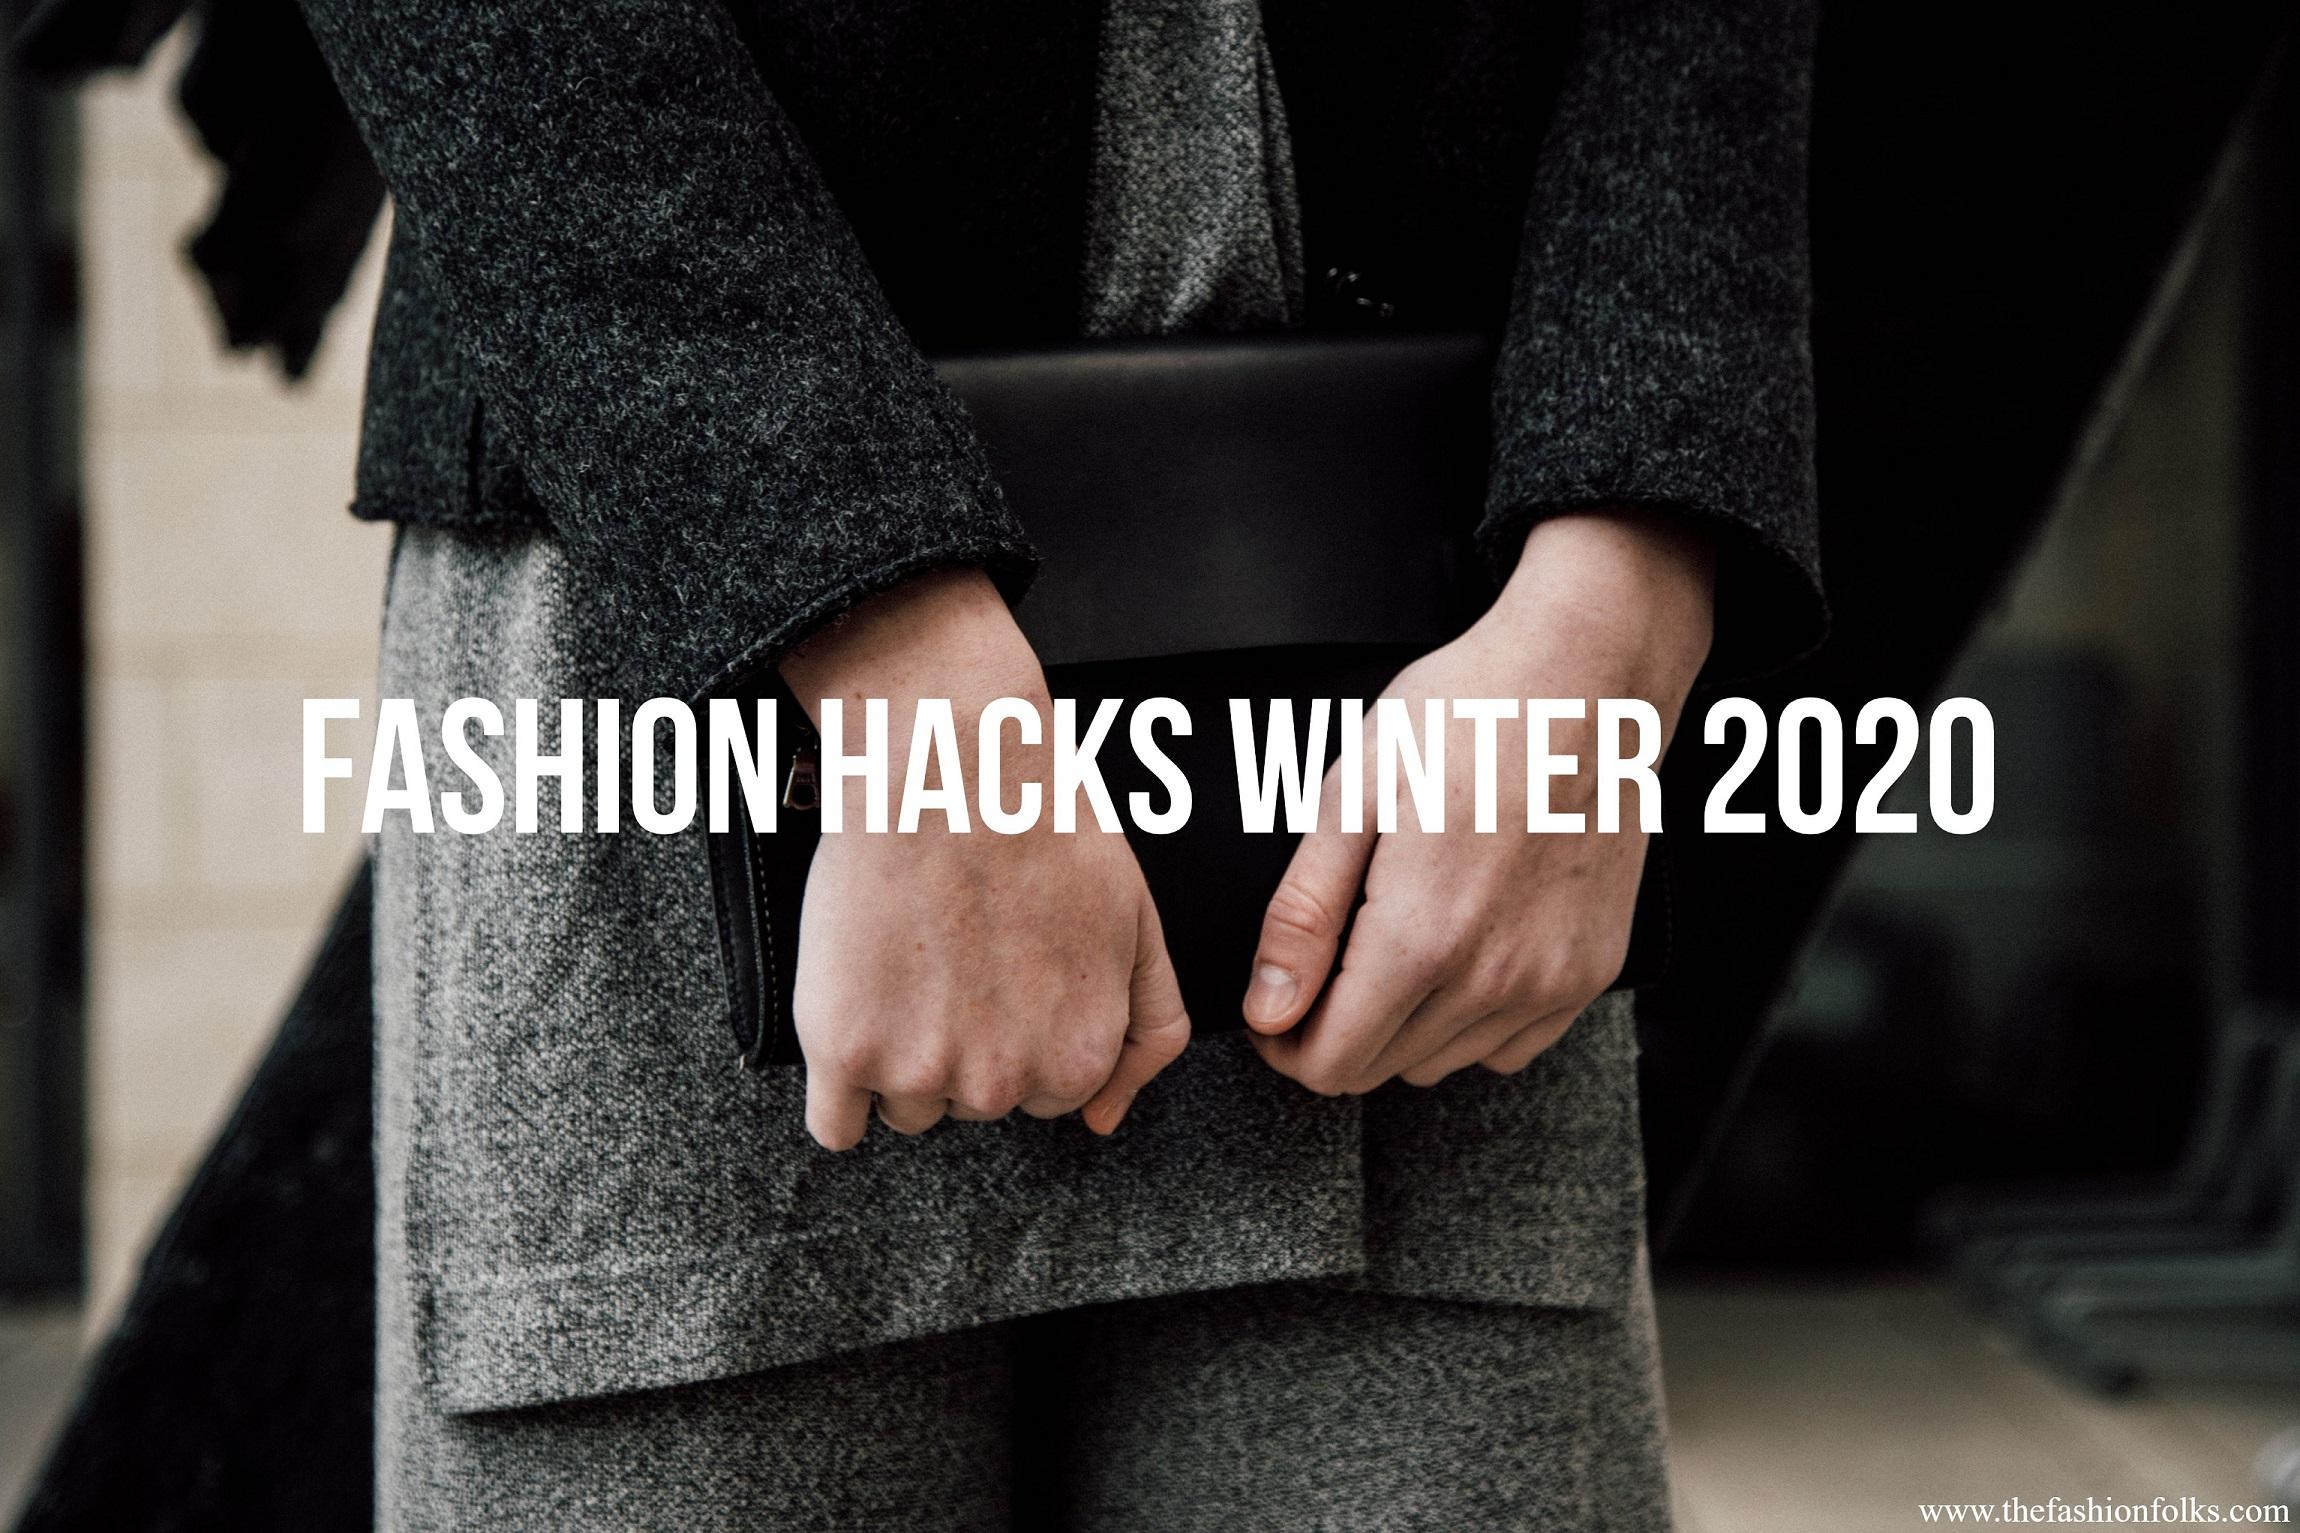 Fashion Hacks Winter 2020